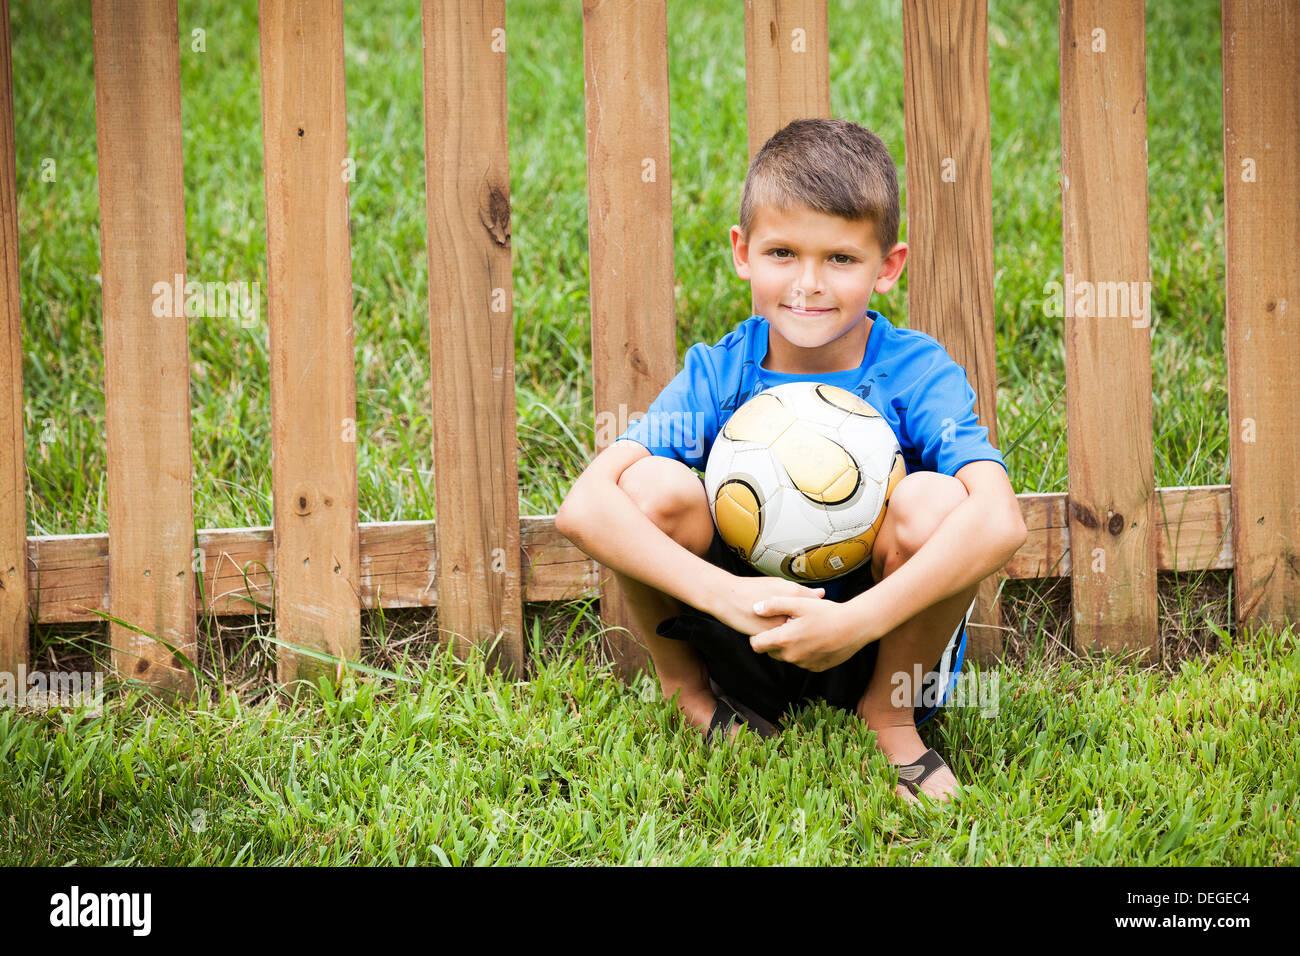 boy holding soccer ball - Stock Image